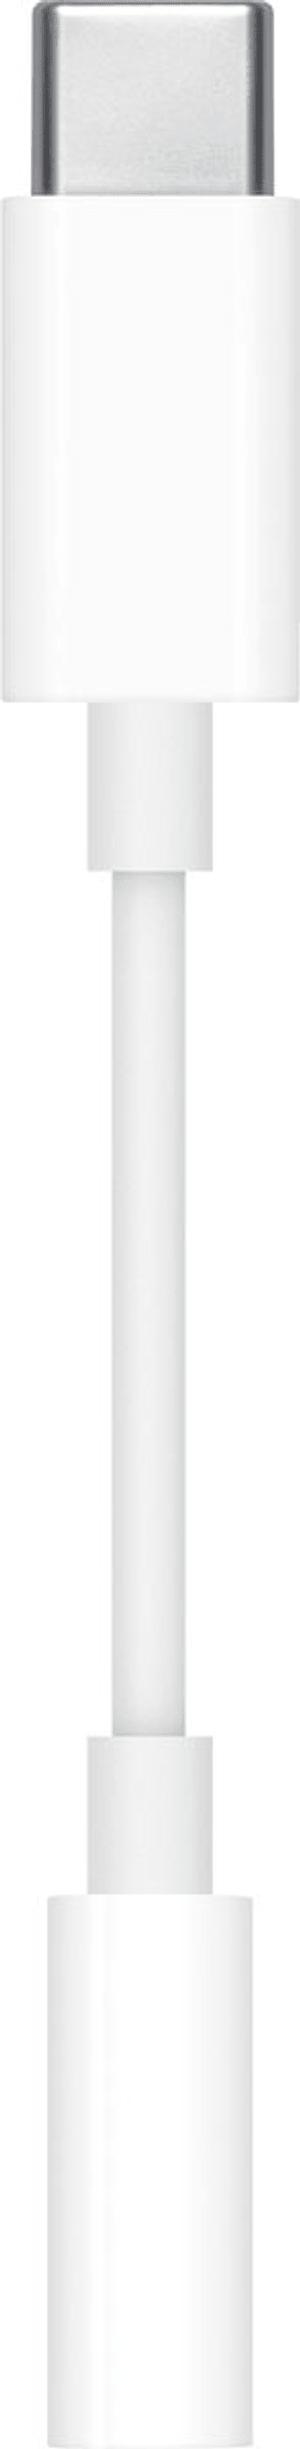 USB‑C auf 3,5‑mm-Kopfhöreranschluss Adapter